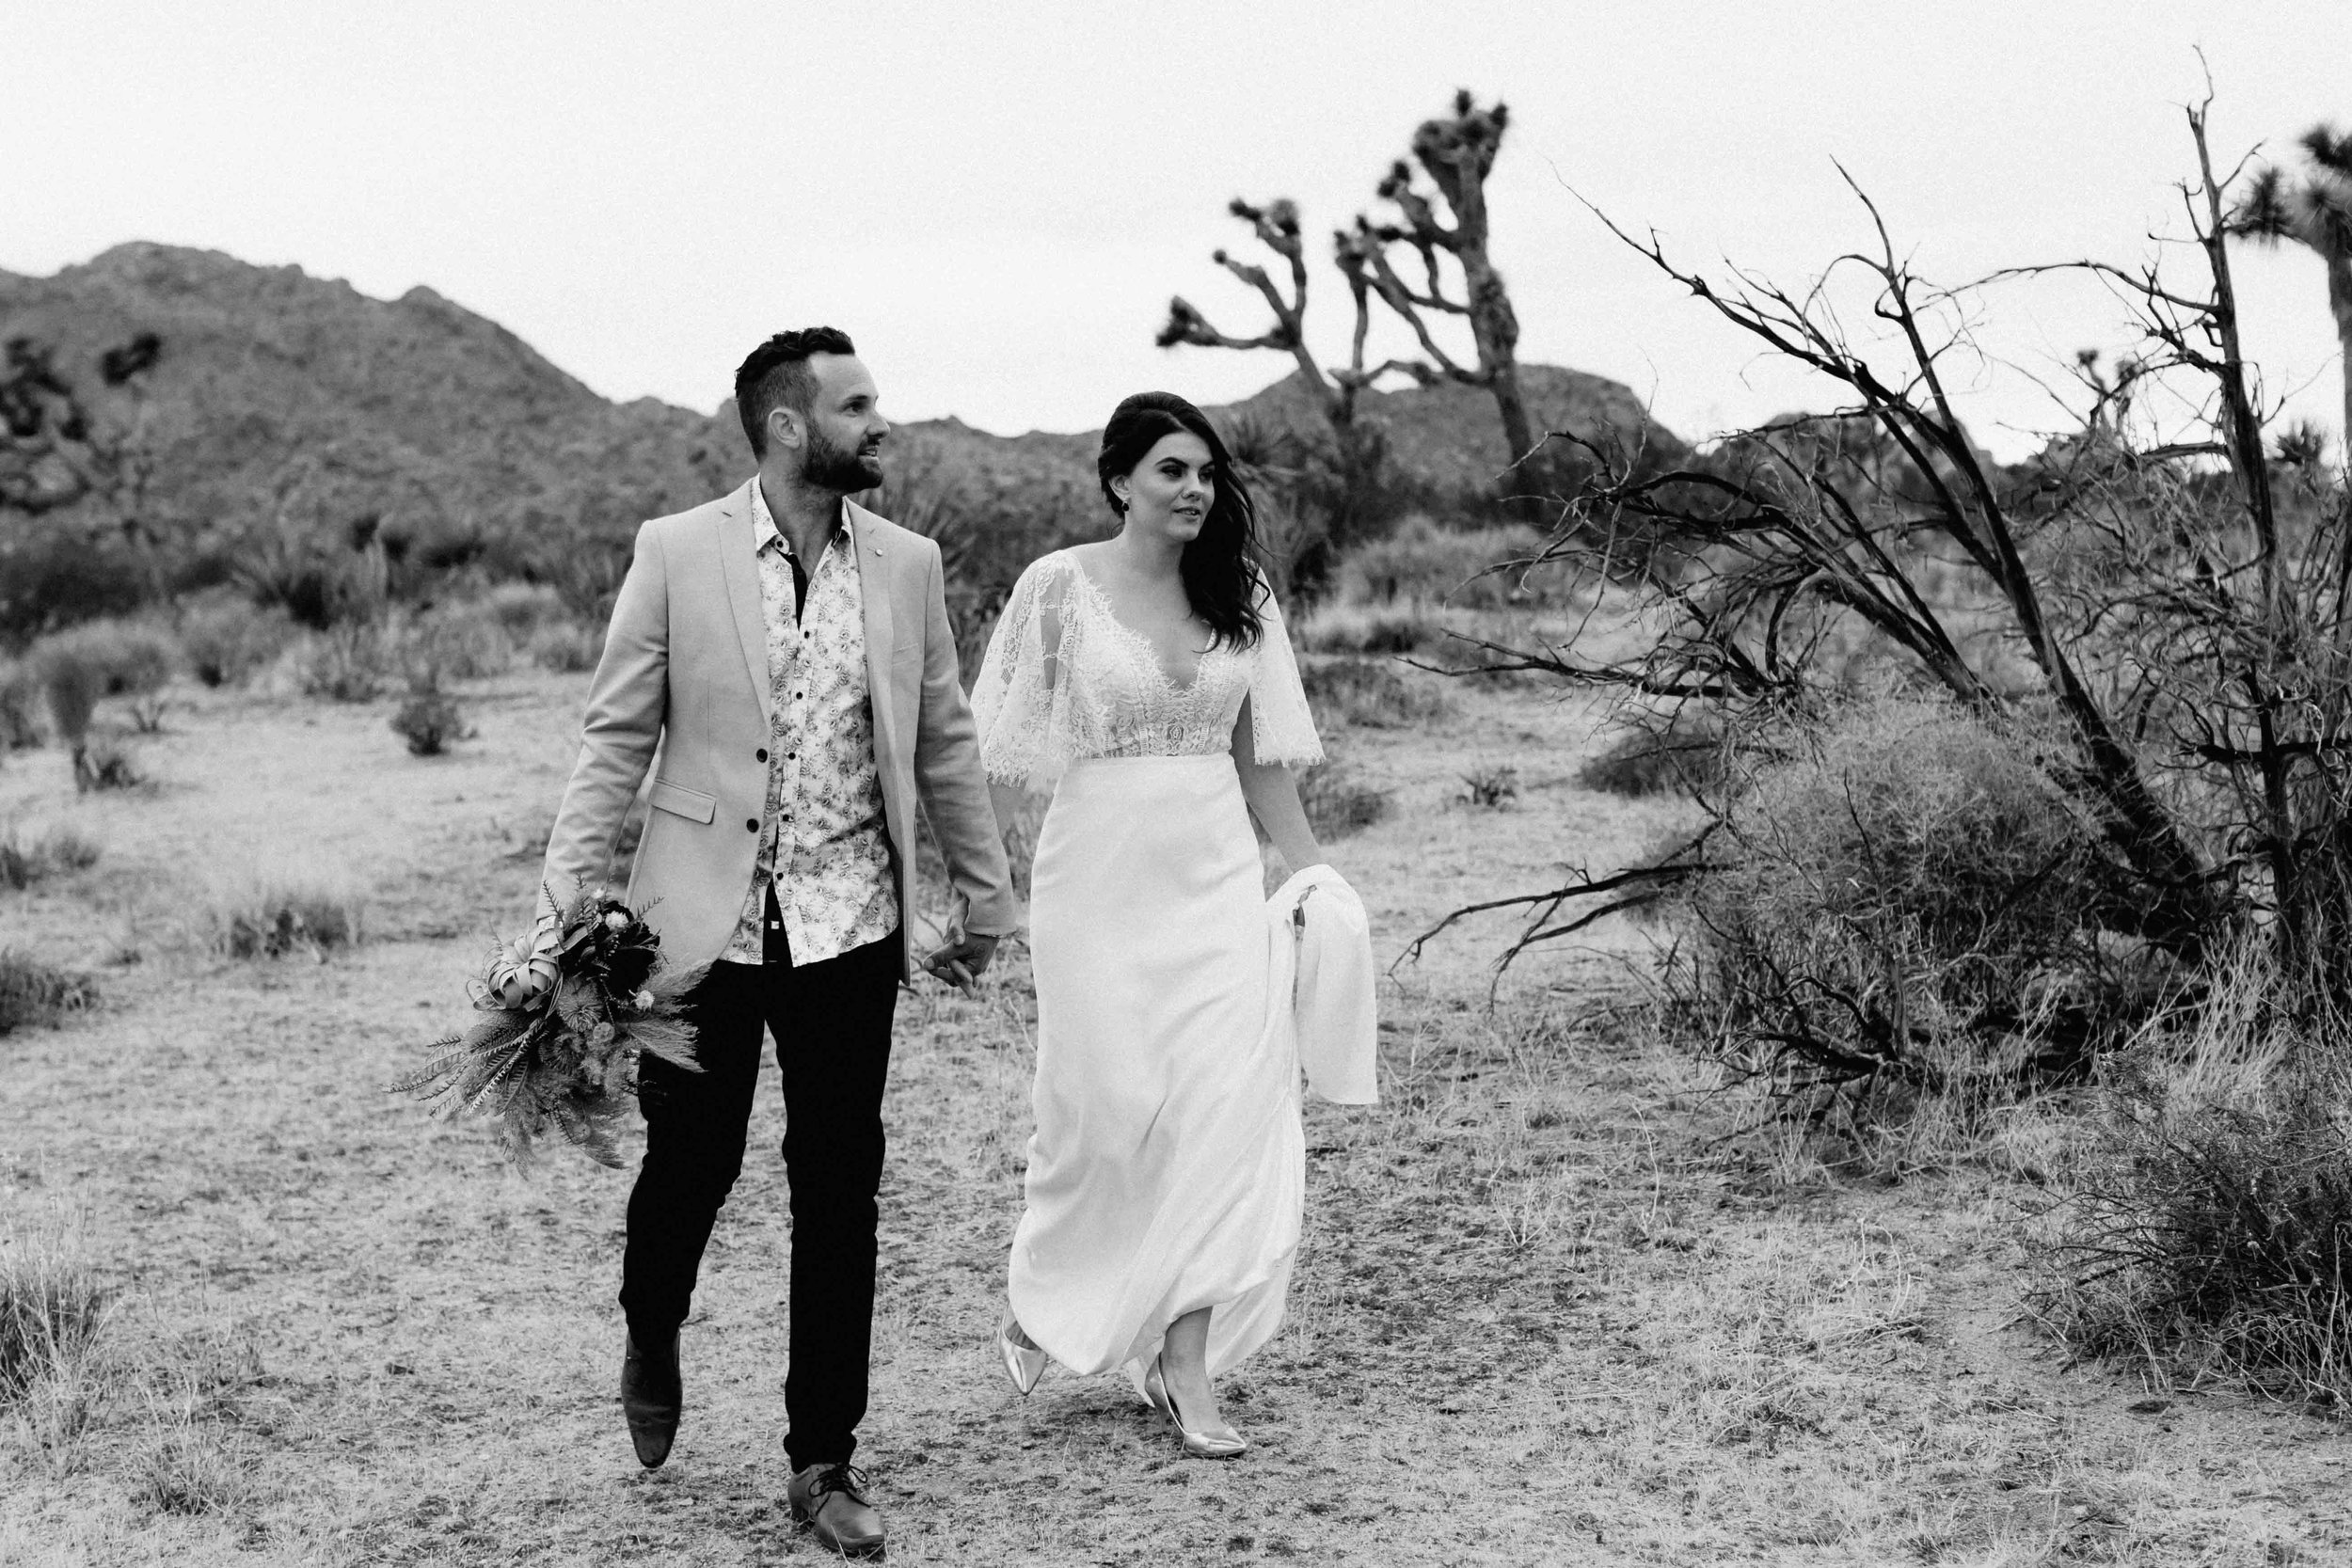 America Joshua Tree Palm Springs Elopement wedding-21.jpg